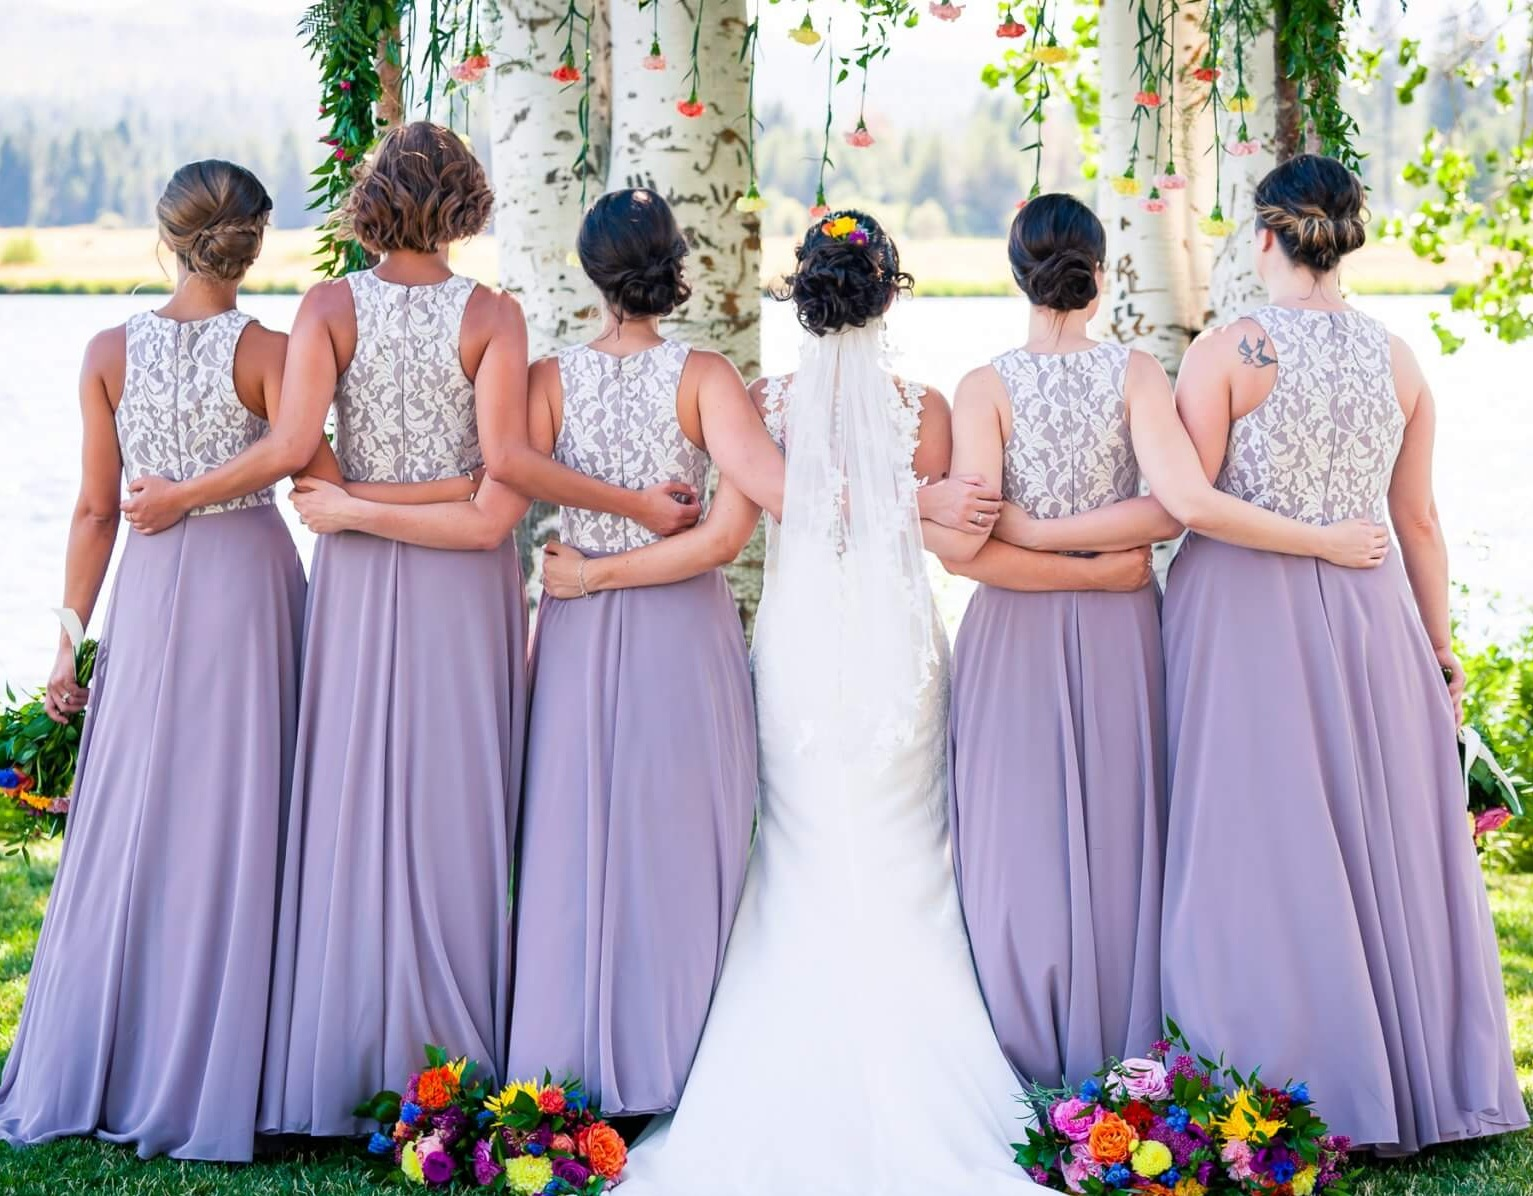 sisters-oregon-wedding-photographers-28-2048x1363.jpg